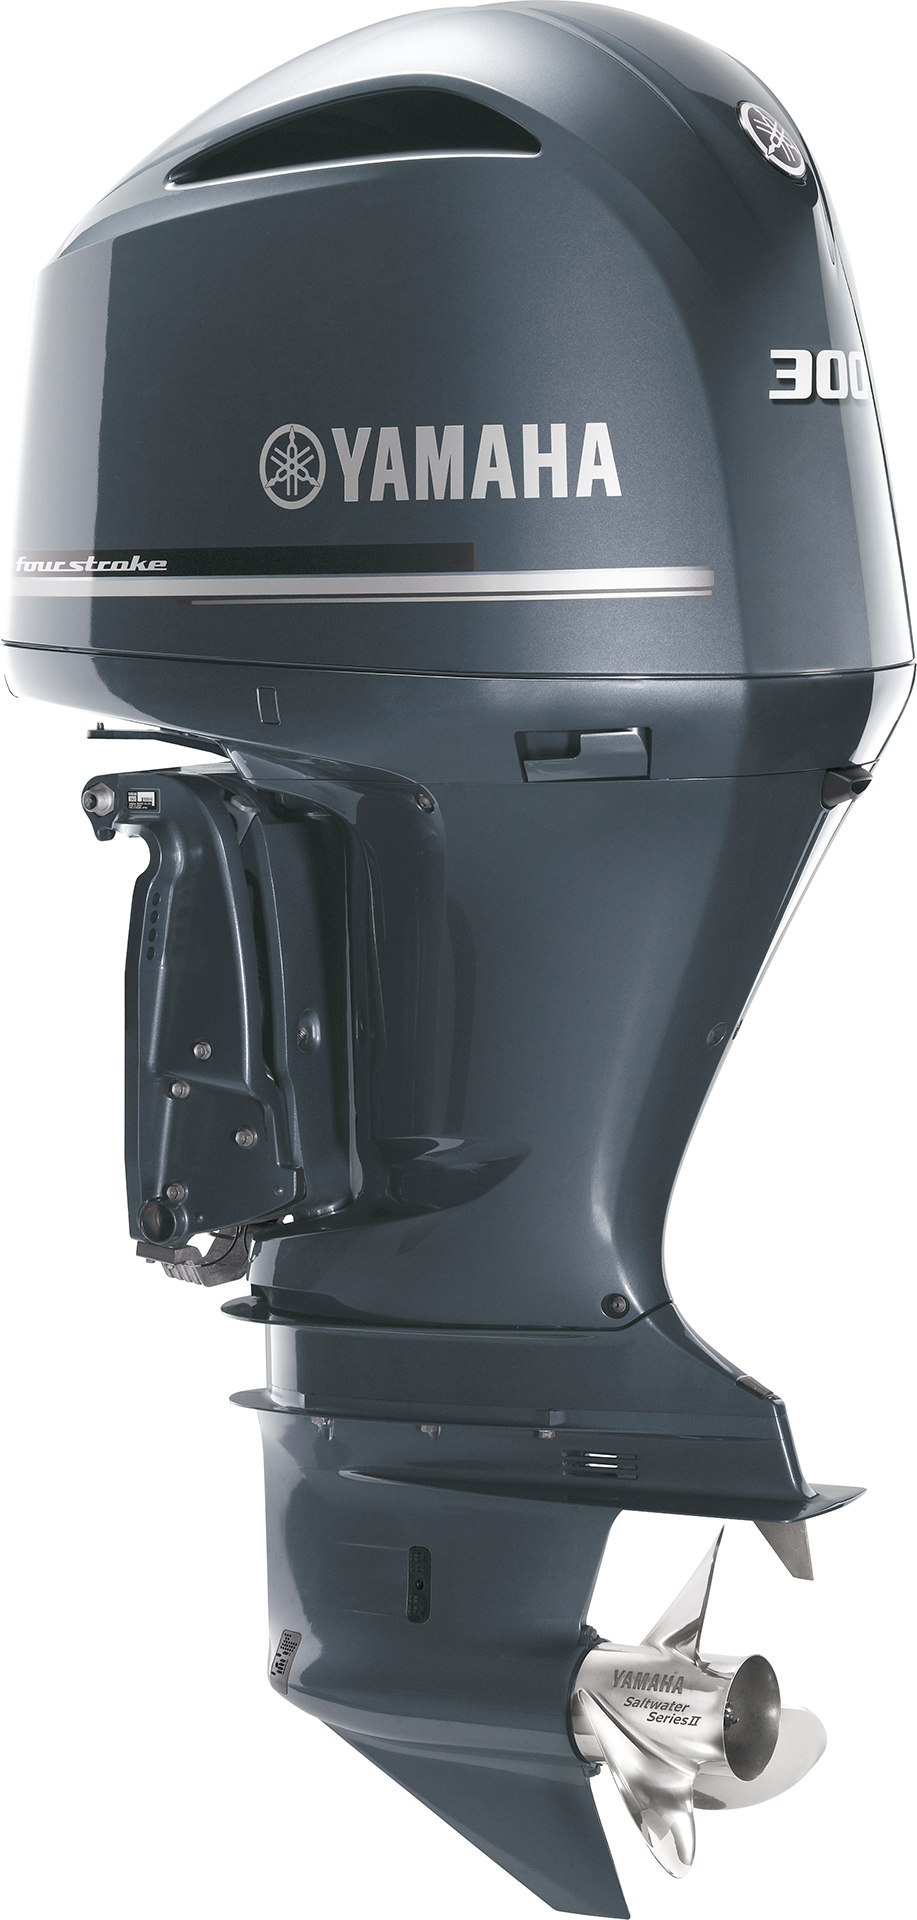 Yamaha F300 Offshore 4.2L